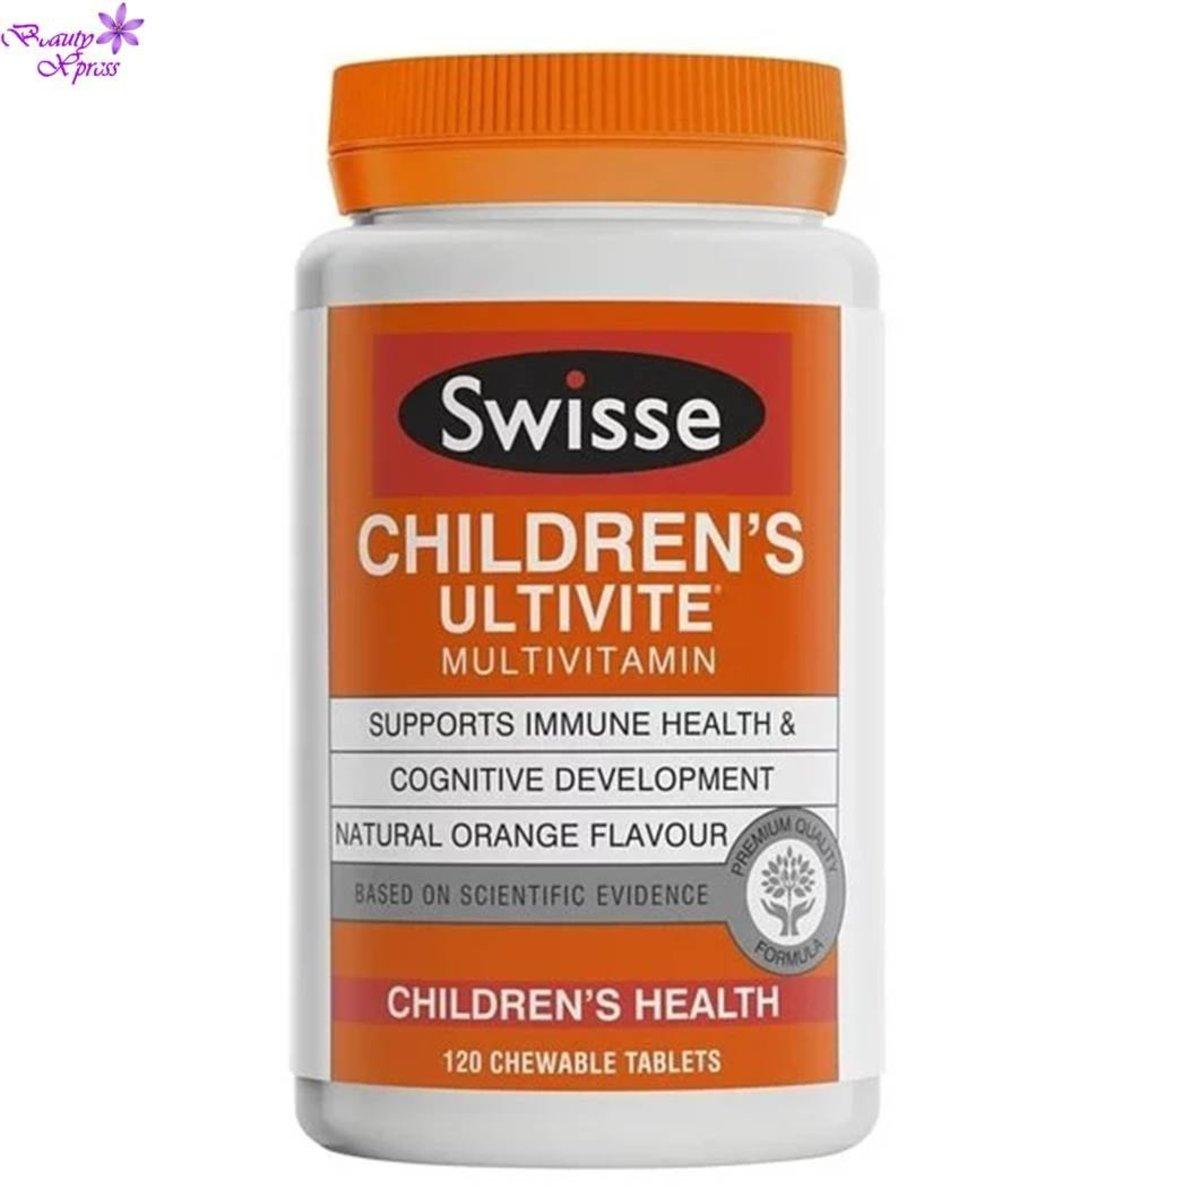 Children's Ultivite Multivitamin Chewable 120's